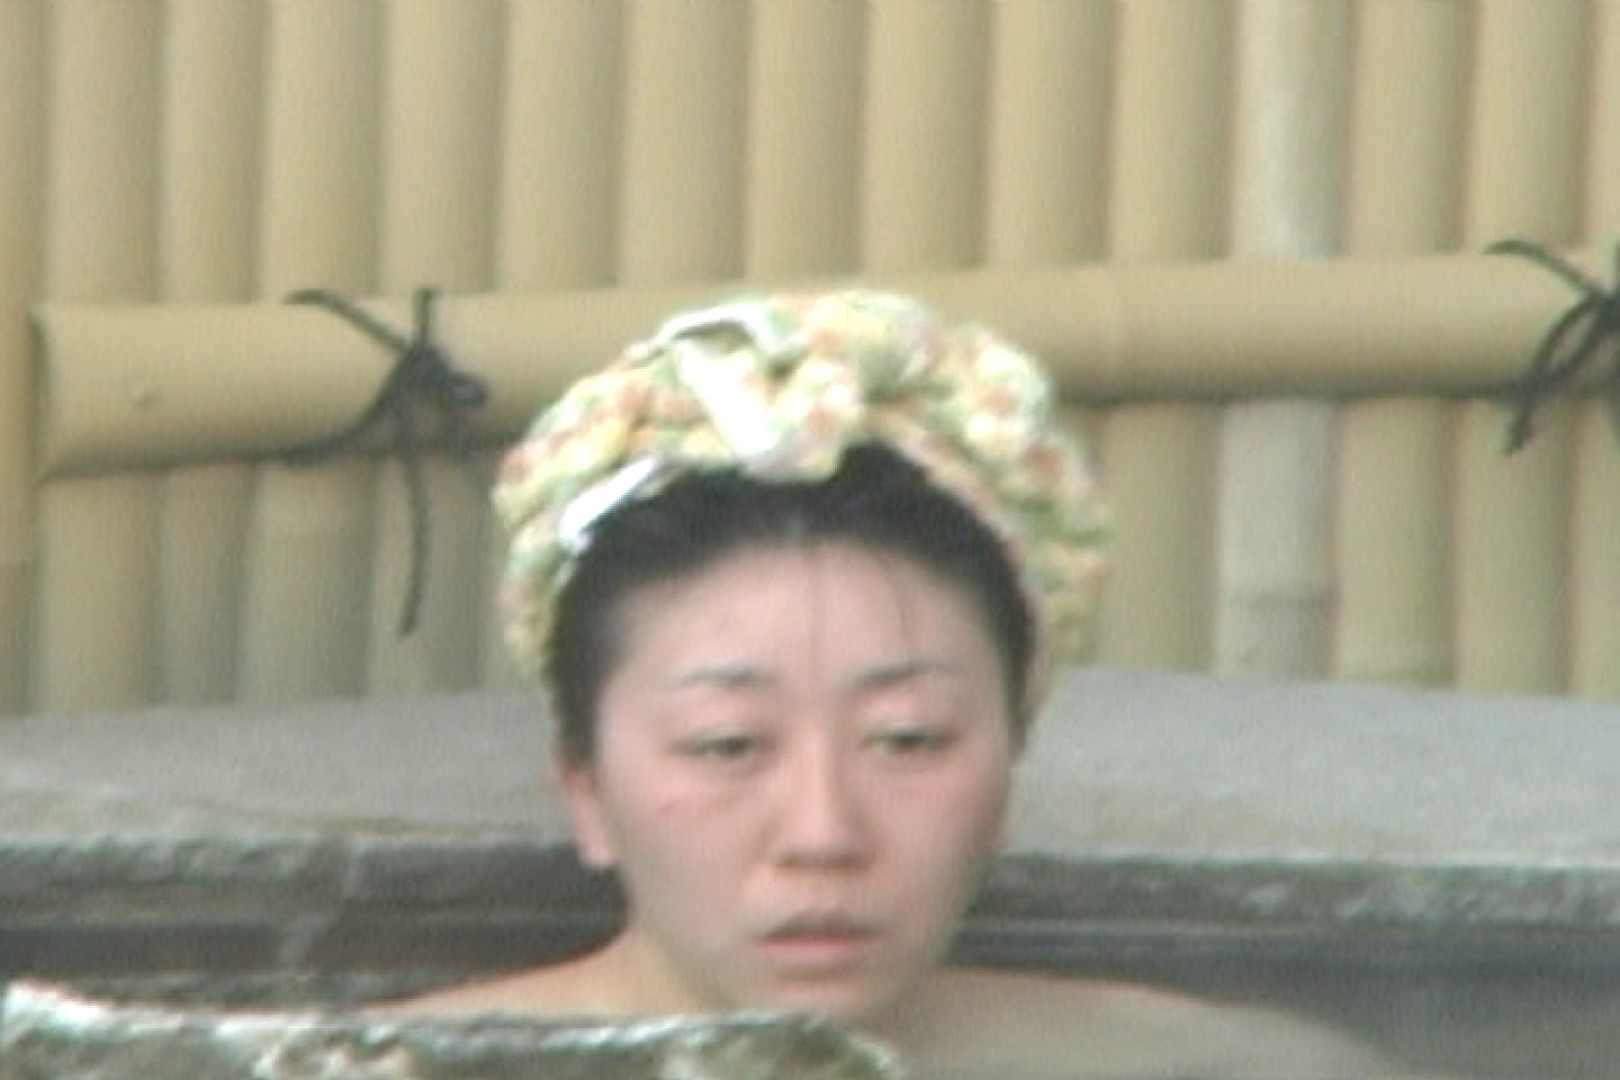 Aquaな露天風呂Vol.594 盗撮師作品  79pic 42